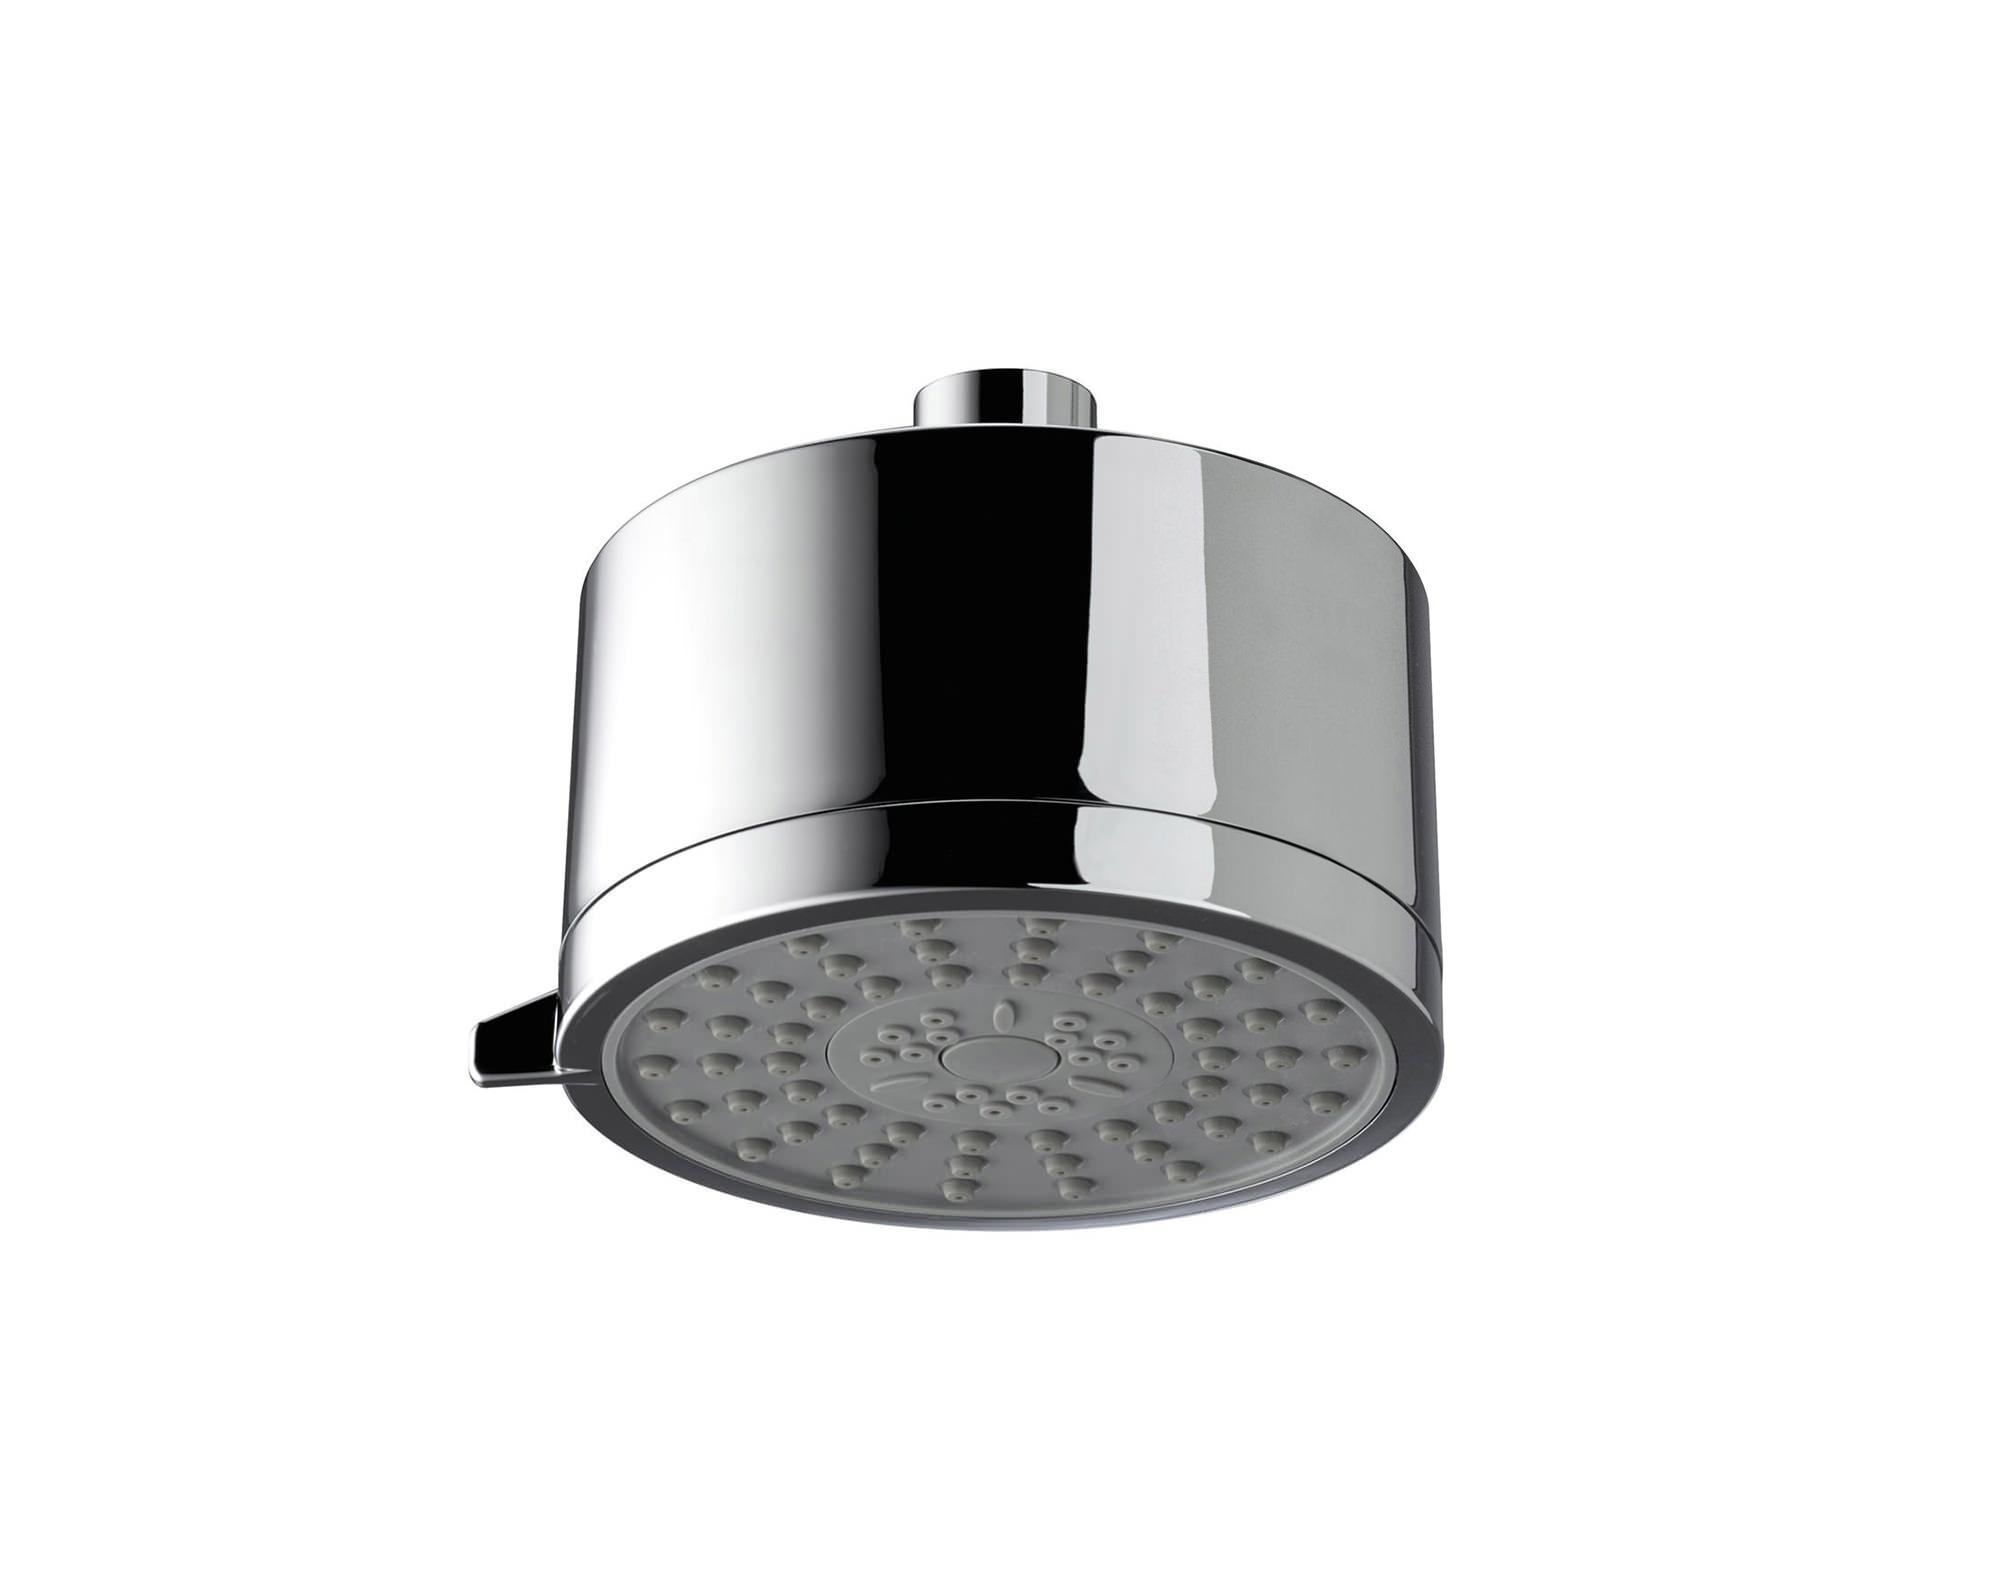 Bristan Multi Function Fixed Shower Head Chrome - FHC CTRD02 C